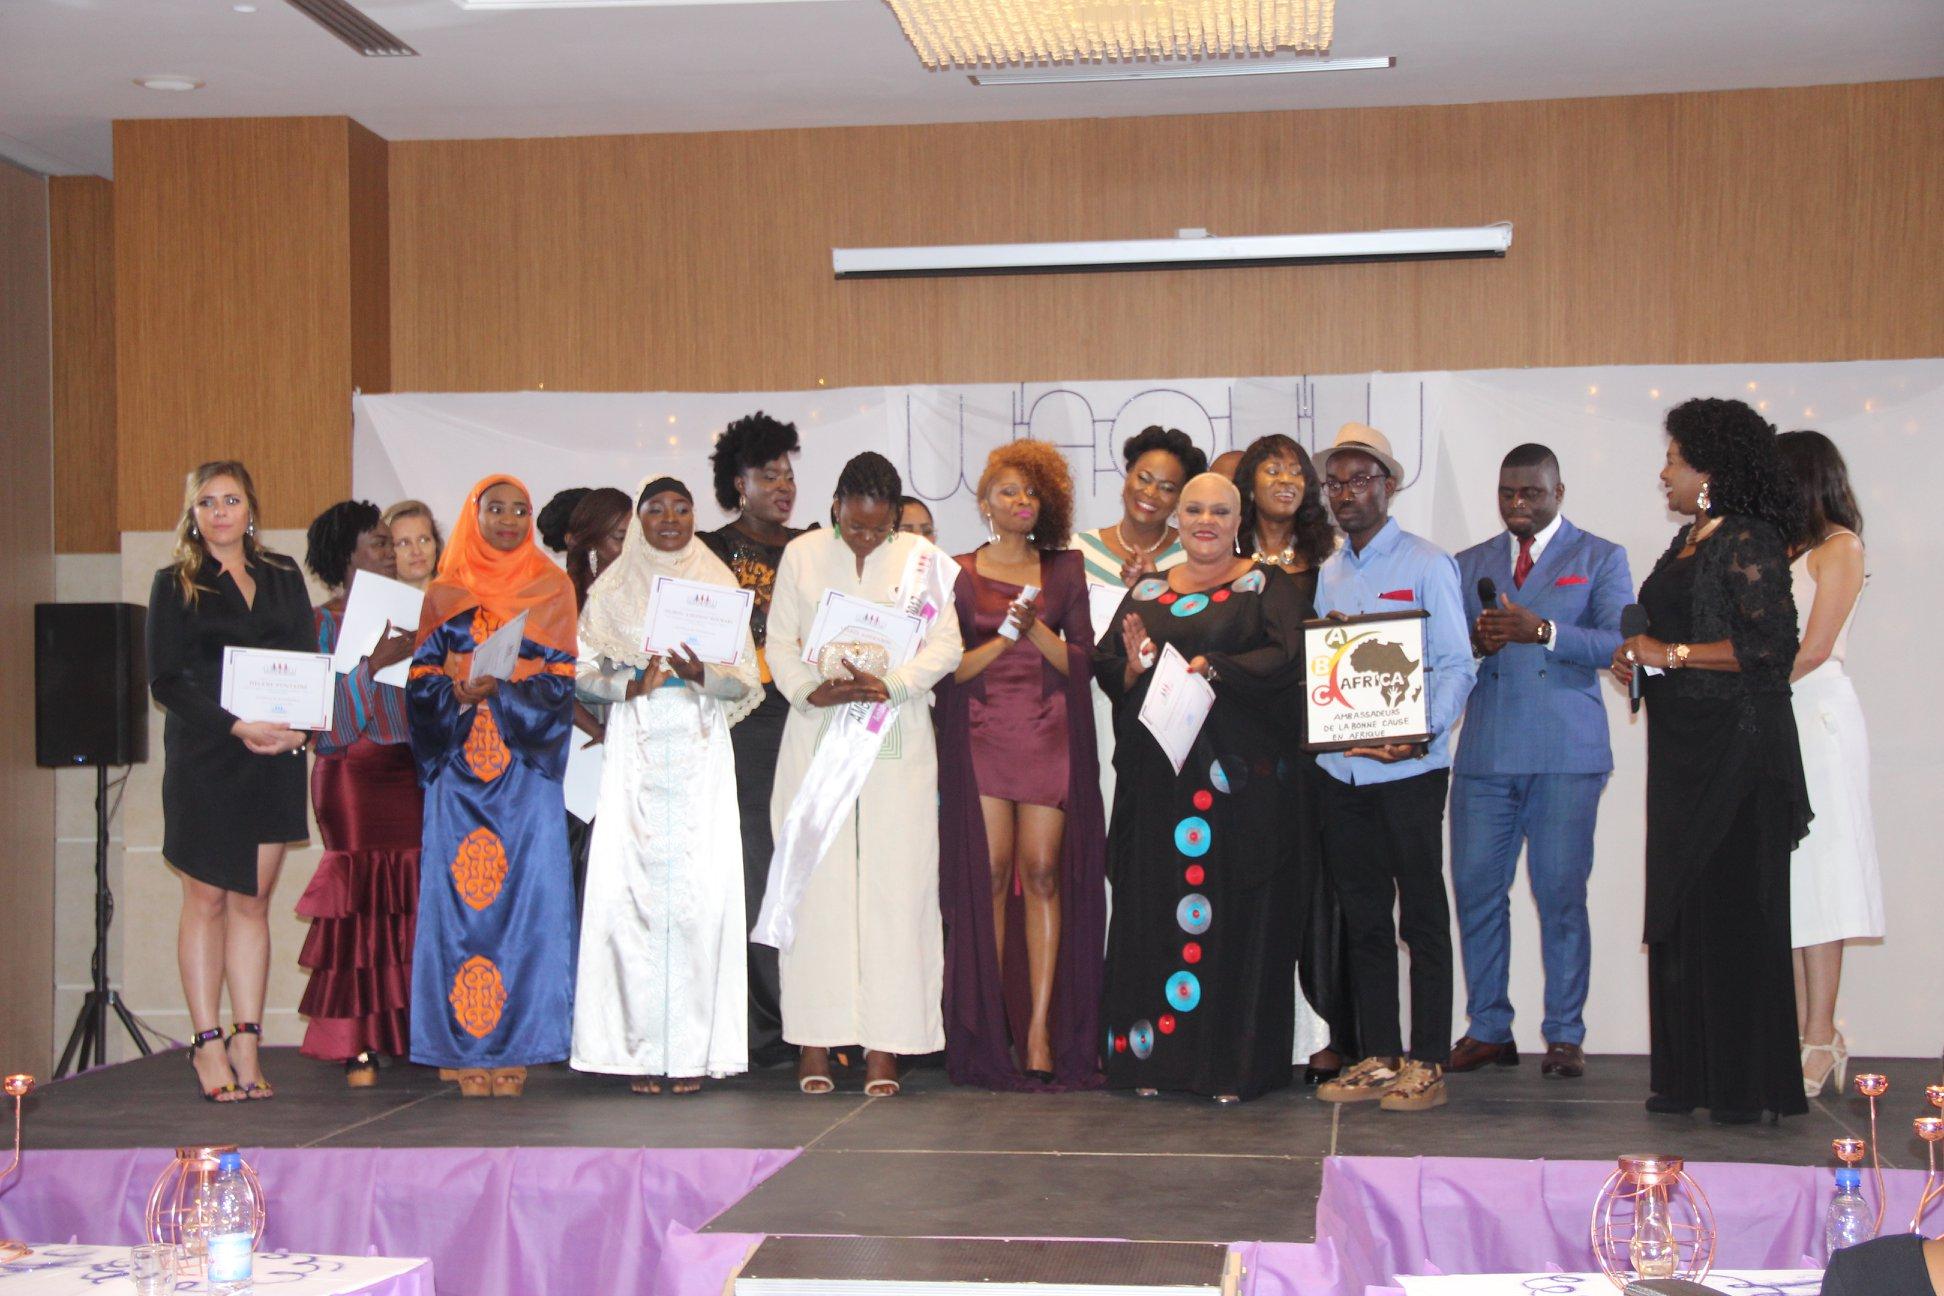 WAOUW: An initiative that promotes women achievements